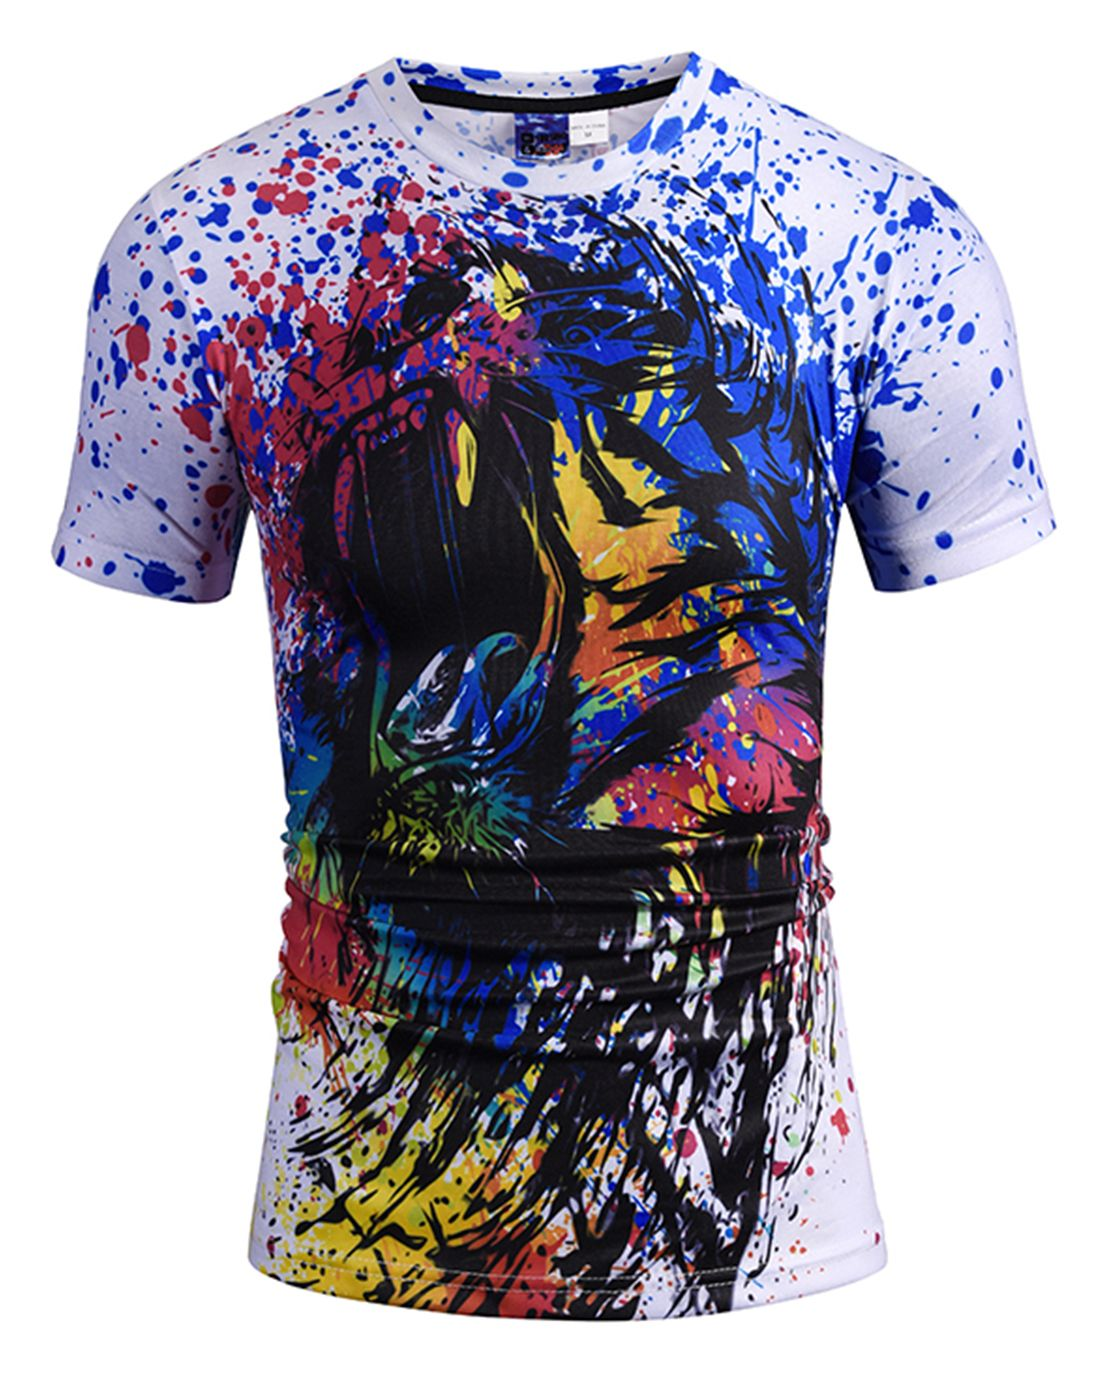 Pizoff Unisex 3d Digital Printing T Shirts Y1625 N1 Pizoff Unisex 3d